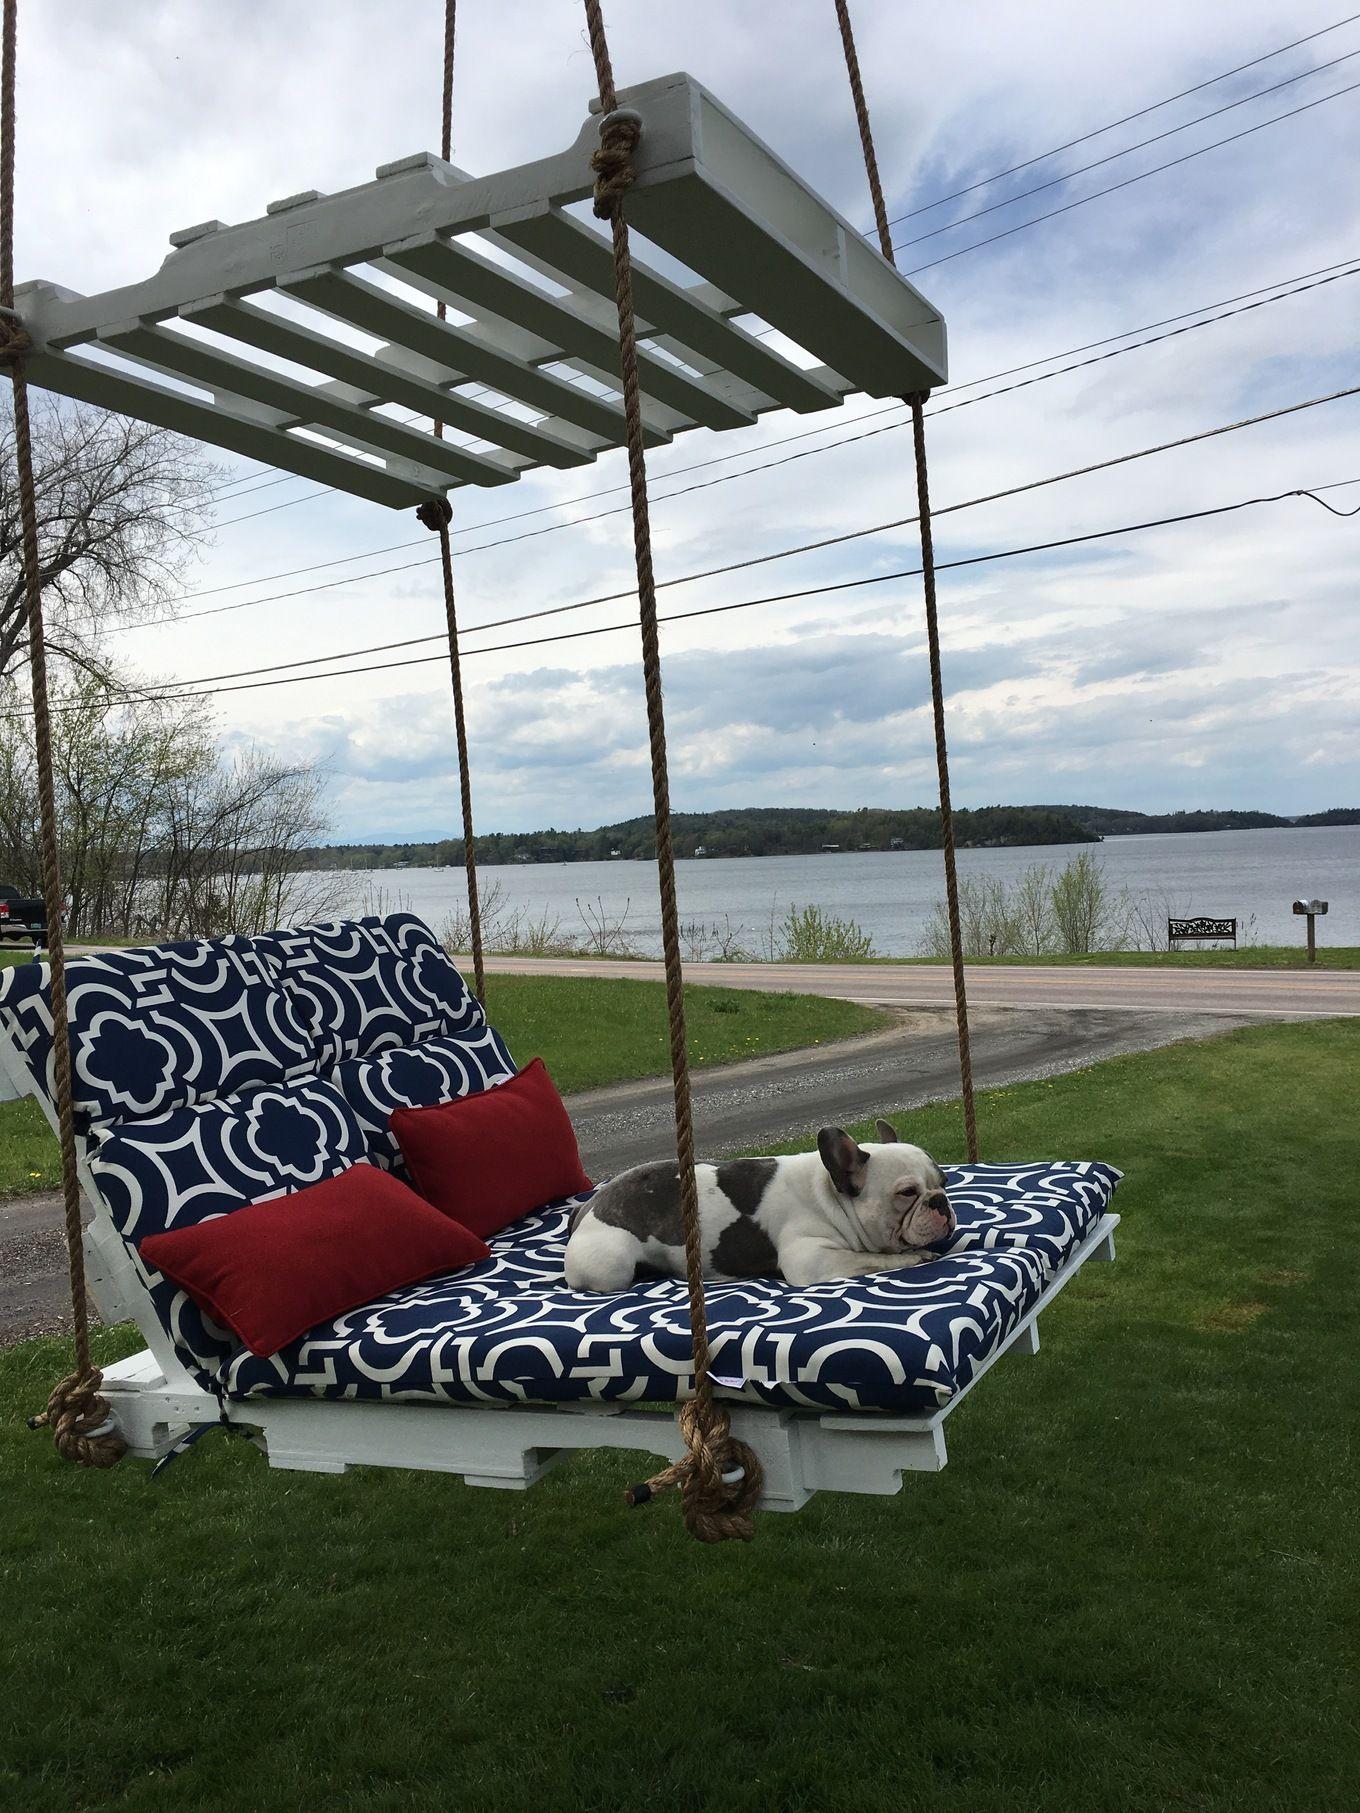 Comment Faire Une Balancelle En Palette made a pallet lounge tree swingand it's awesome